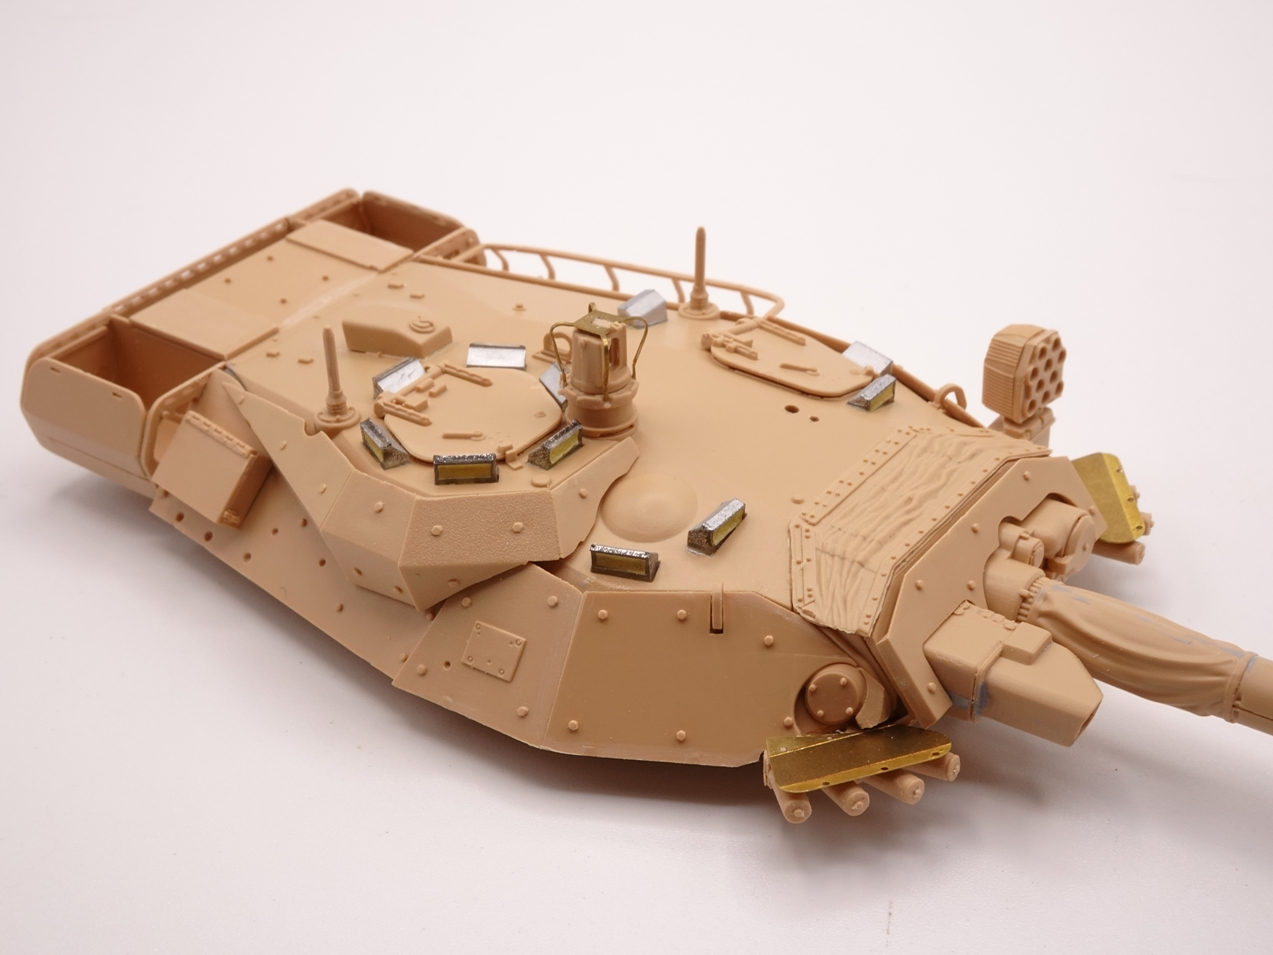 [Tiger Model] AMX-10RCR réf. 4602 - 1/35 - Page 2 Amx10-1907-8